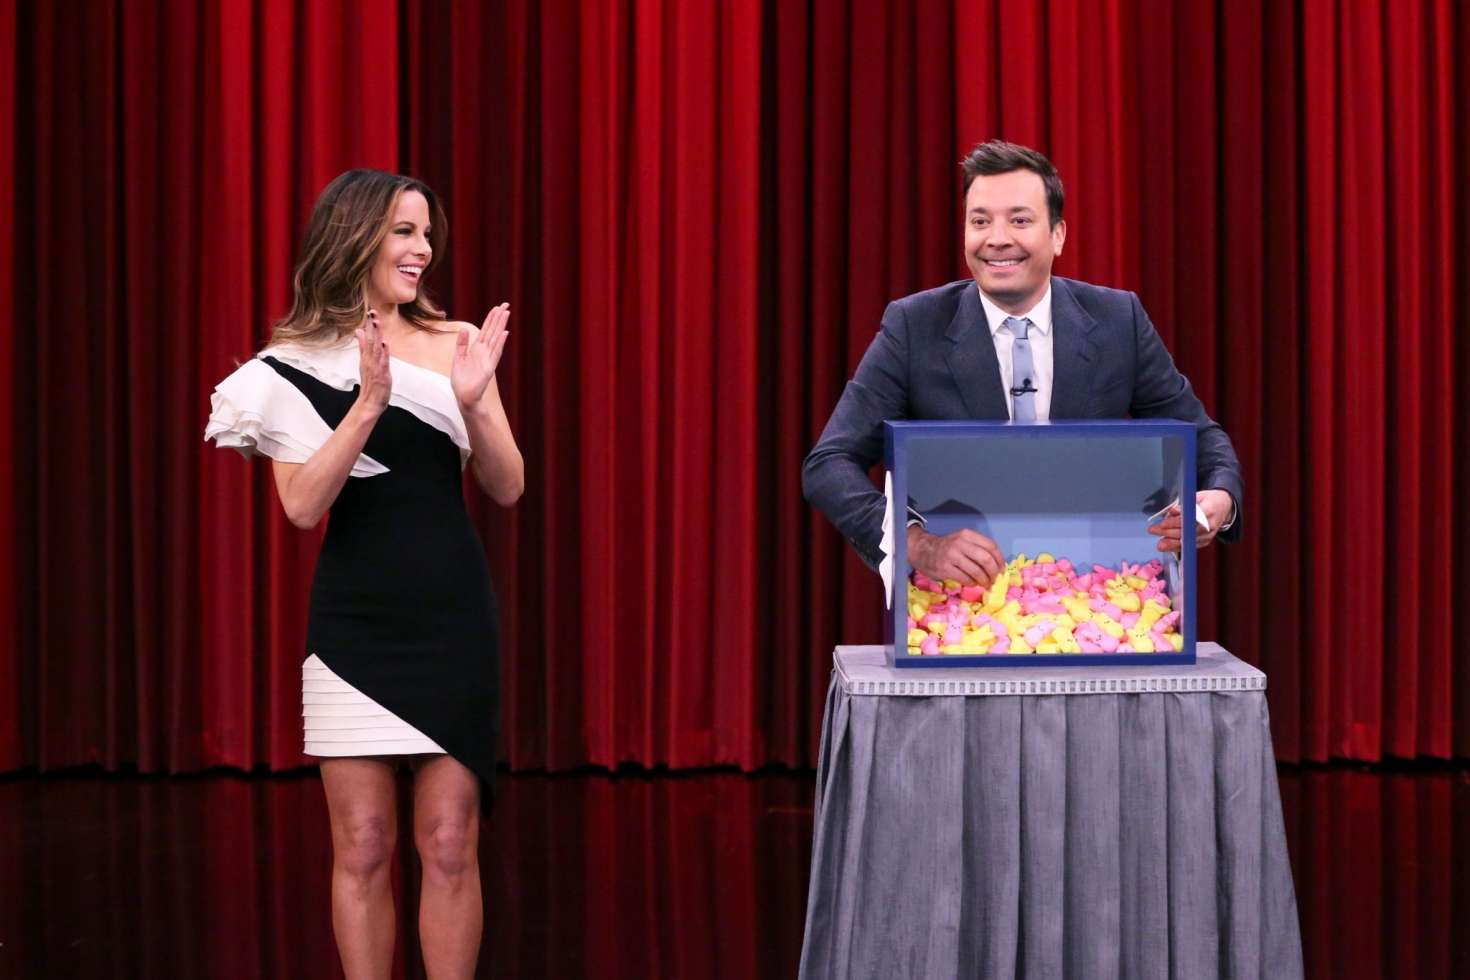 Kate Beckinsale 2019 : Kate Beckinsale: On The Tonight Show Starring Jimmy Fallon -03